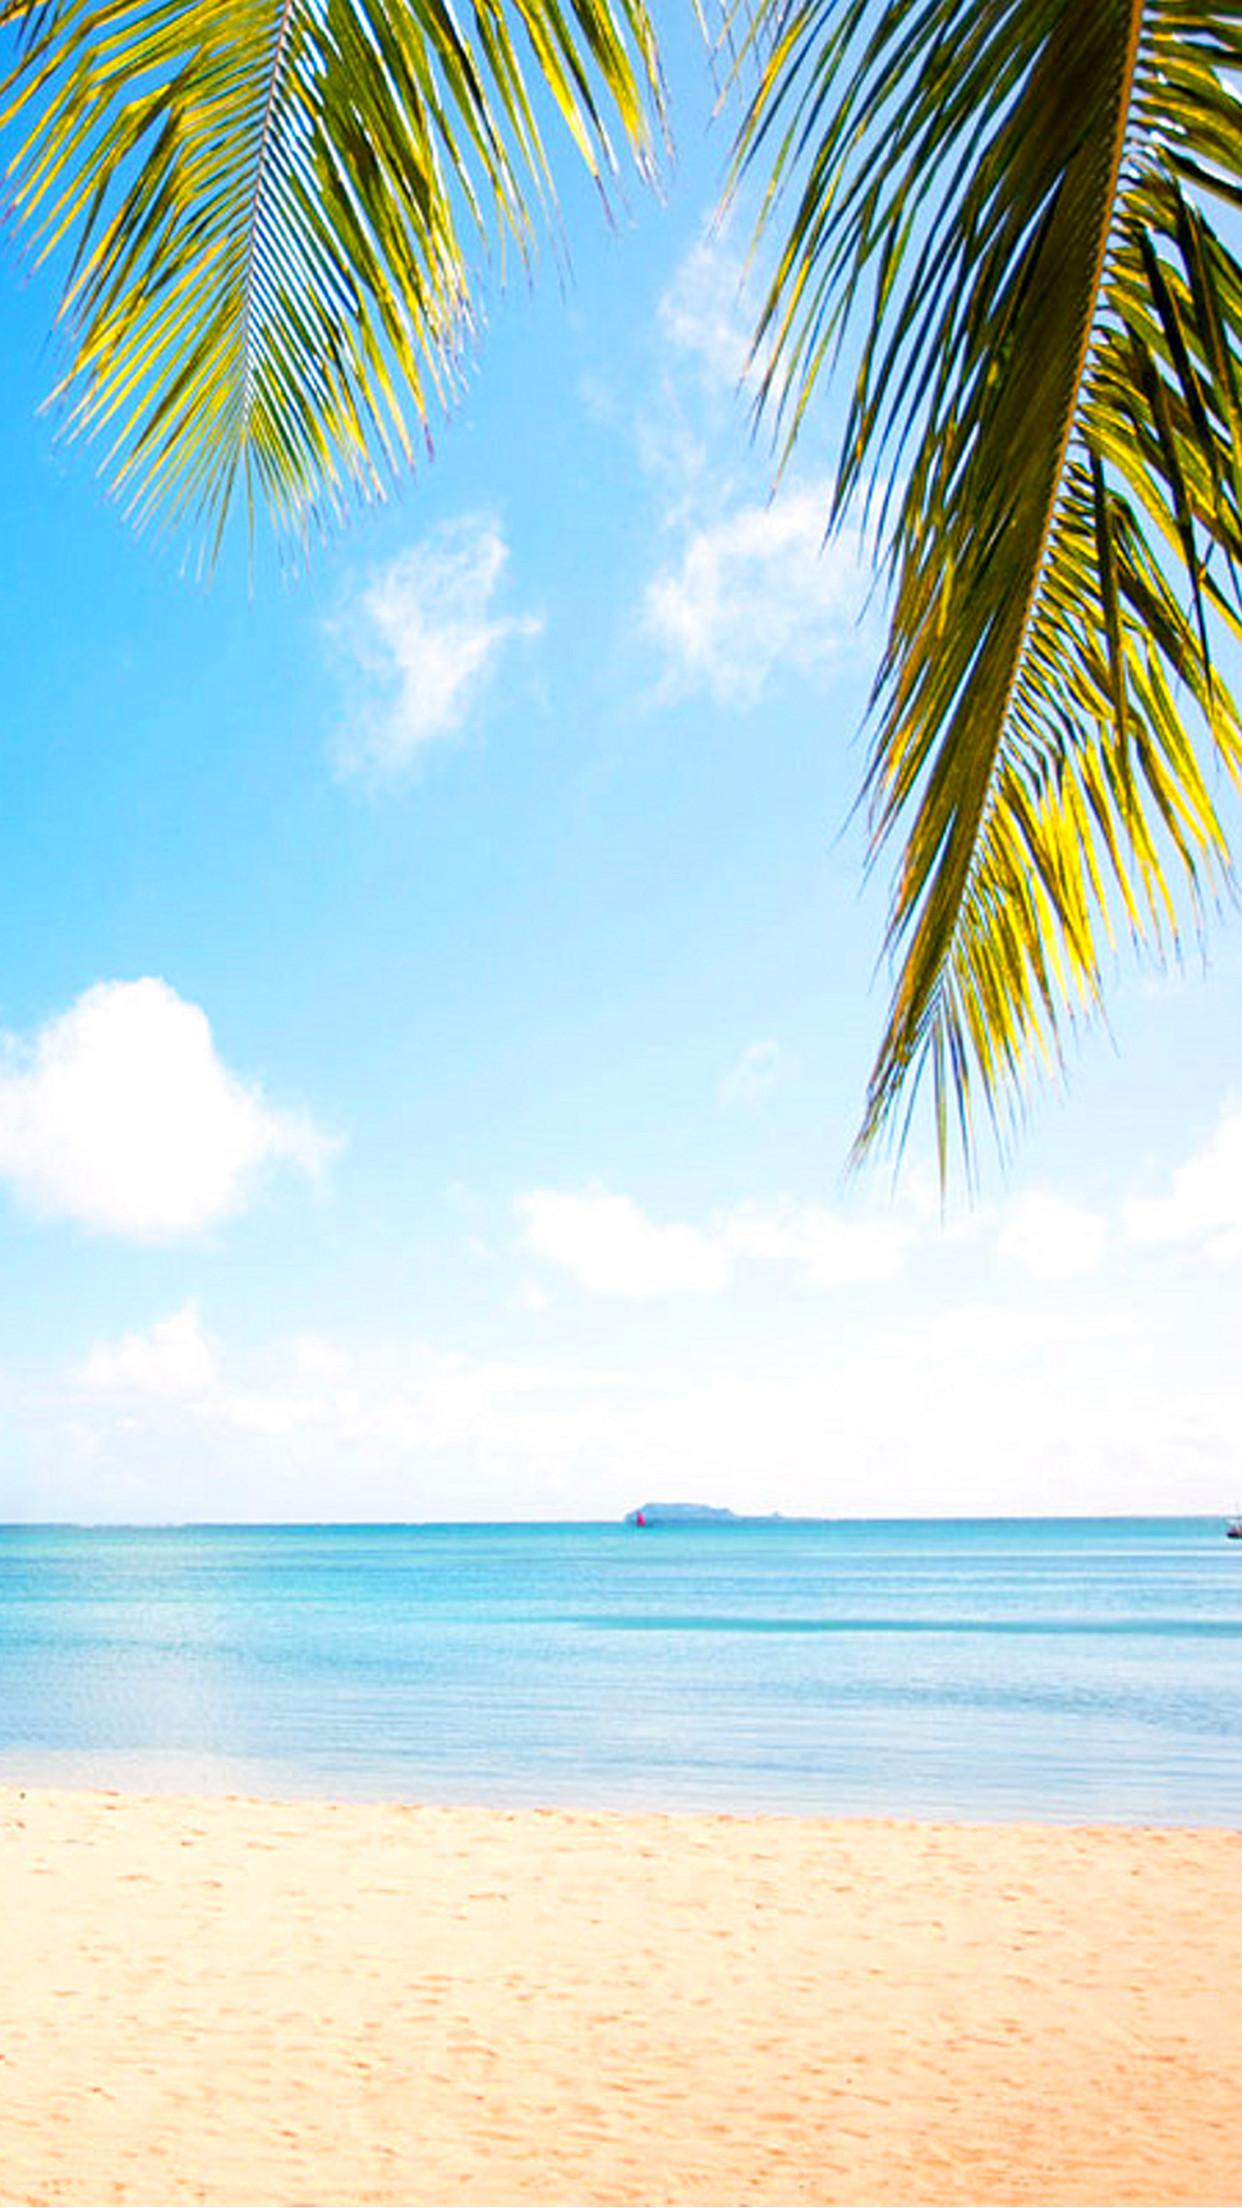 Wallpaper HD iPhone Mauritius beach paradise – Free Download